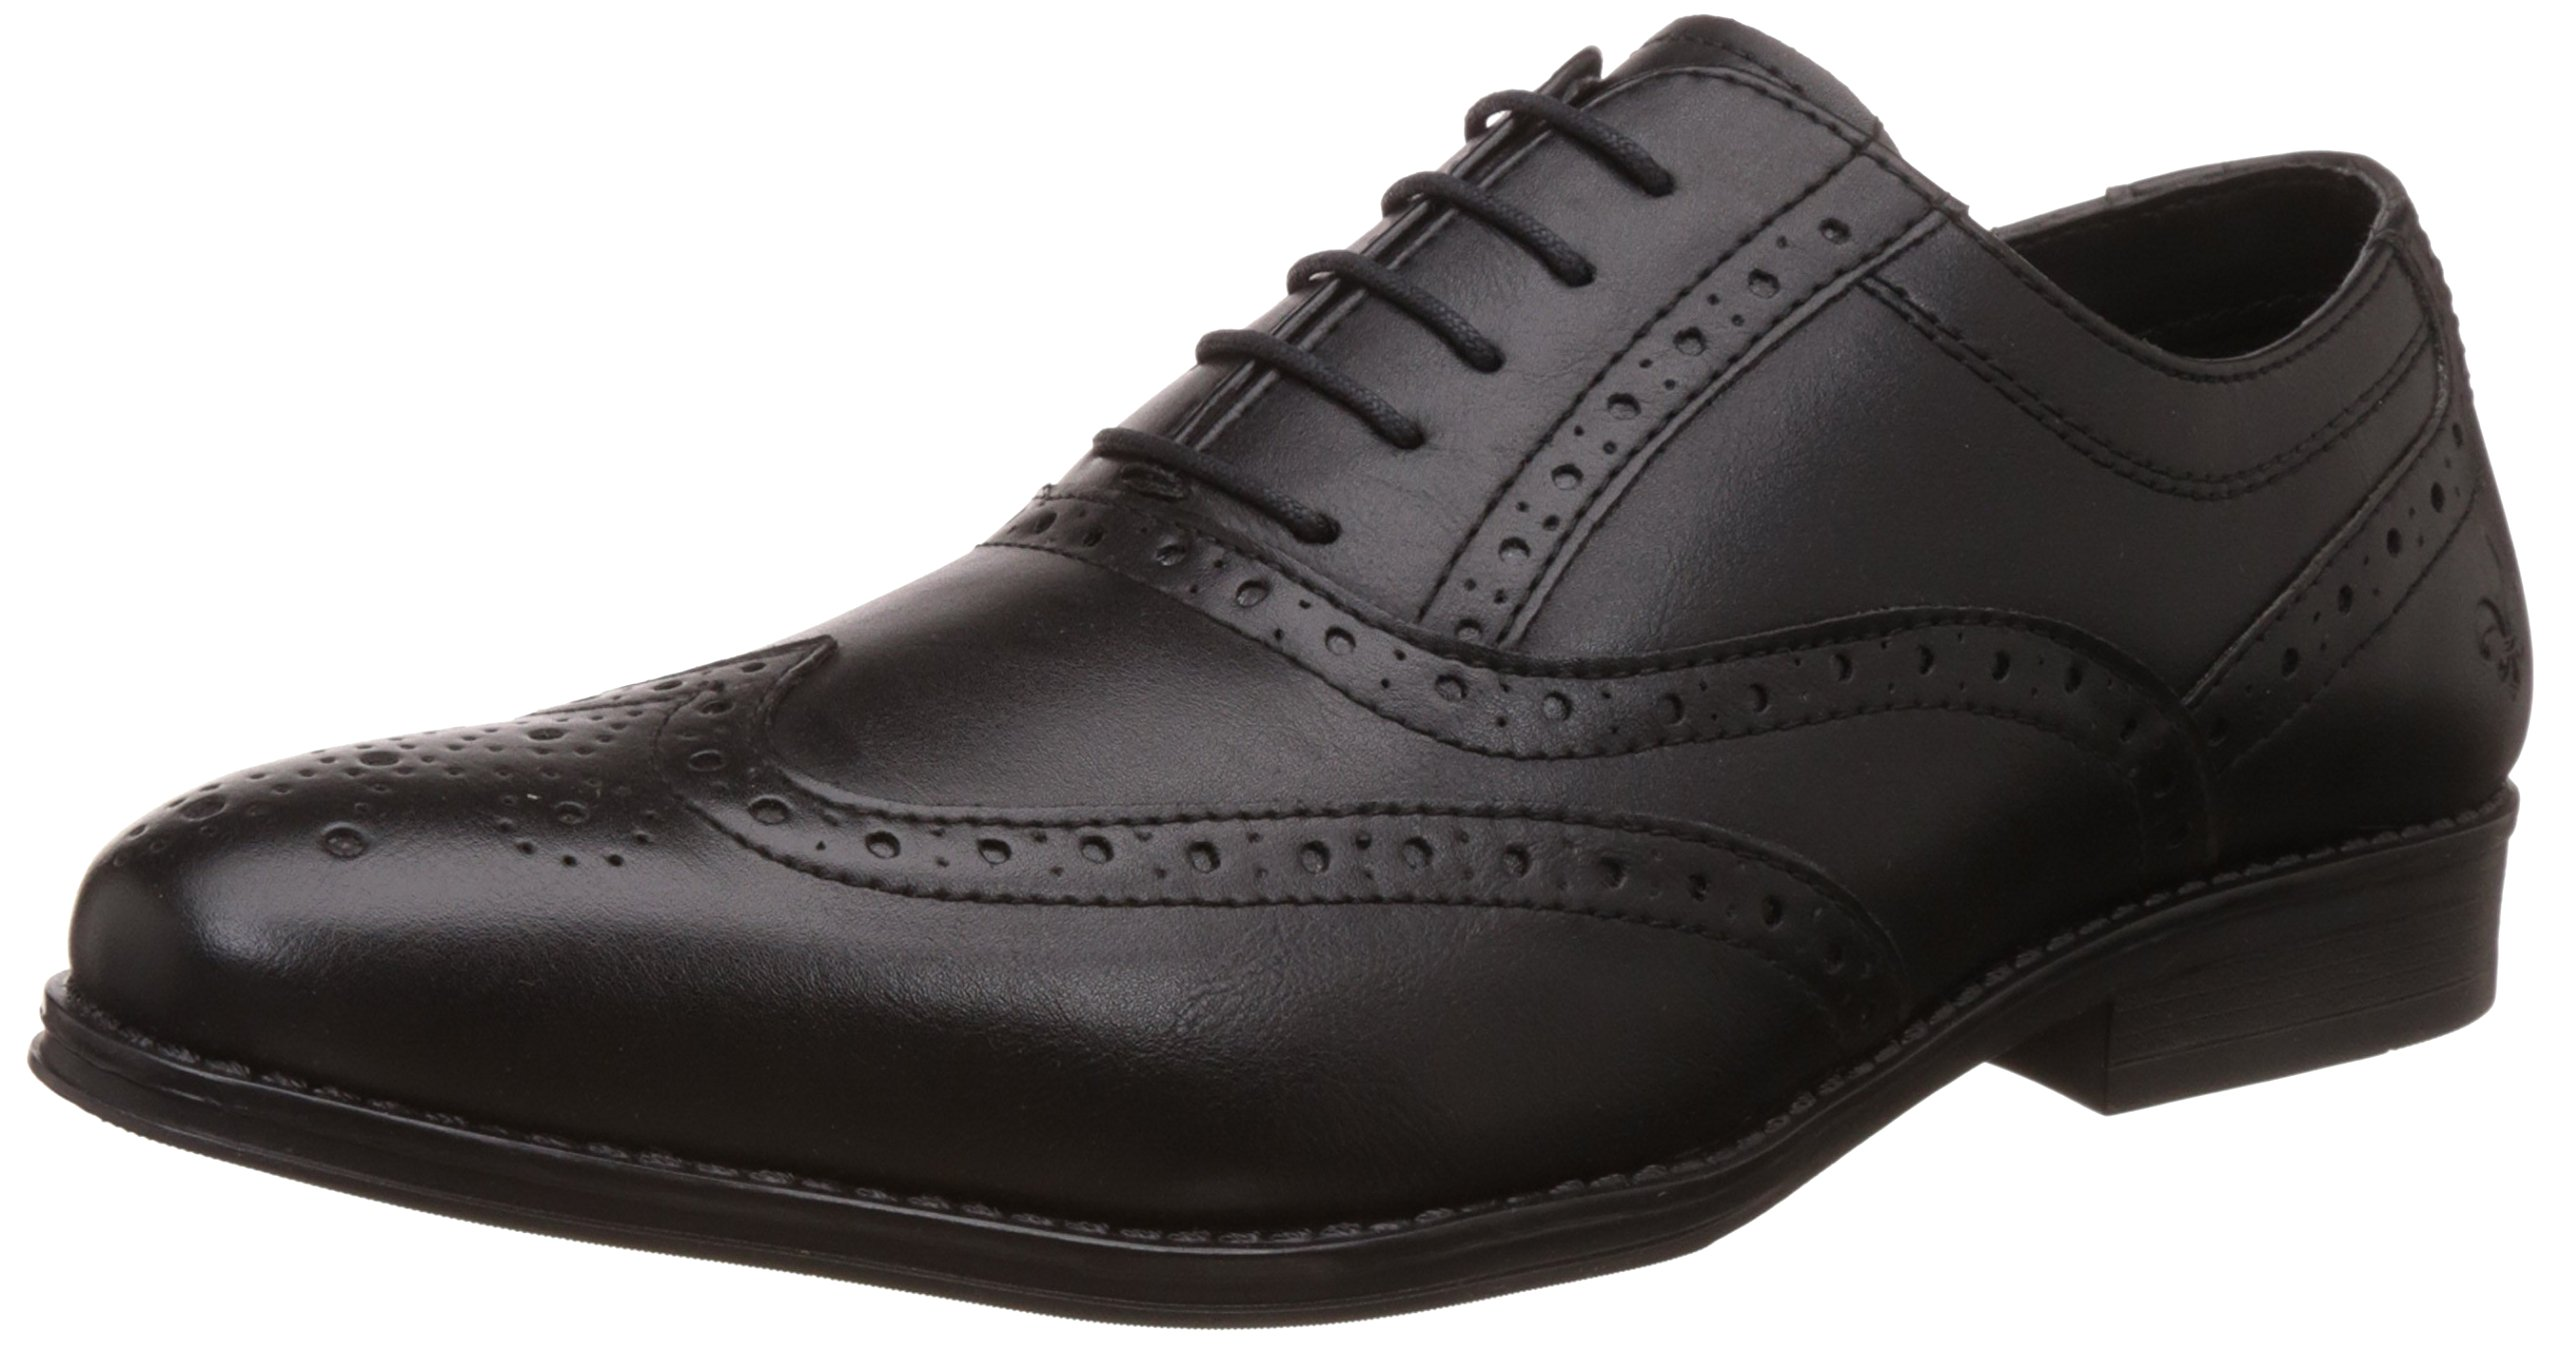 Red Tape) Men's Formal Shoes